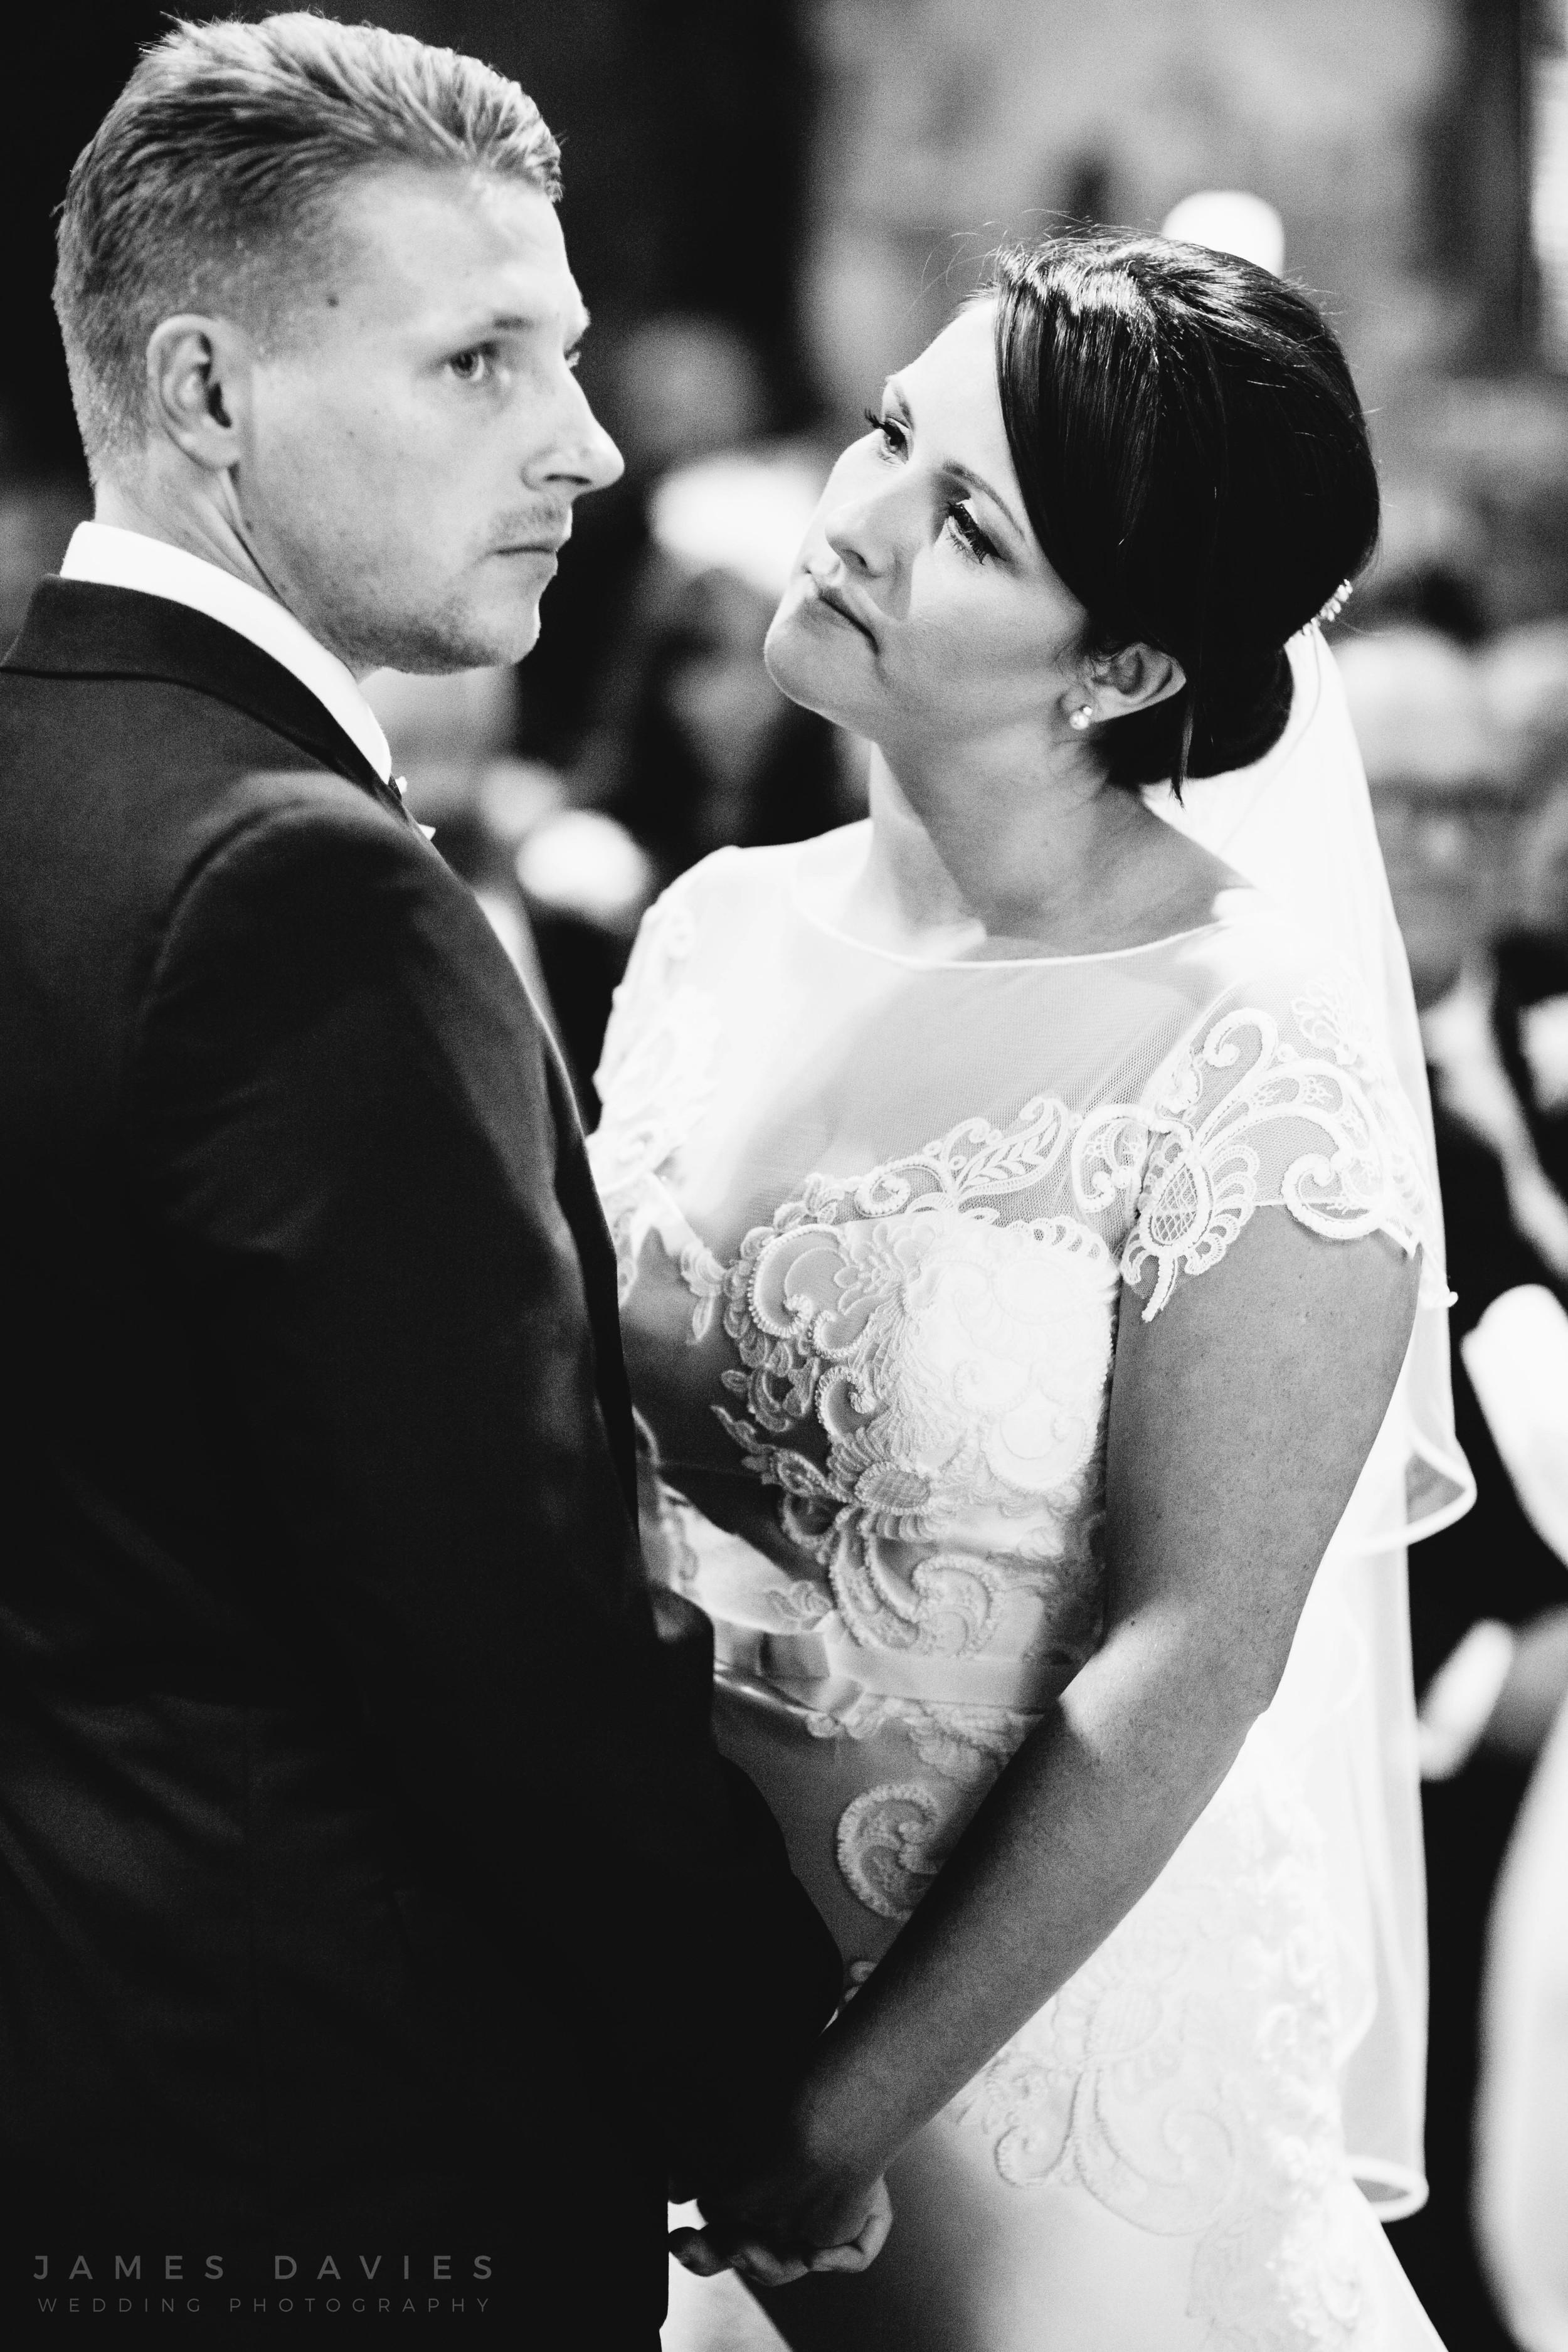 Thanet Wedding Photographer James Davies.jpg